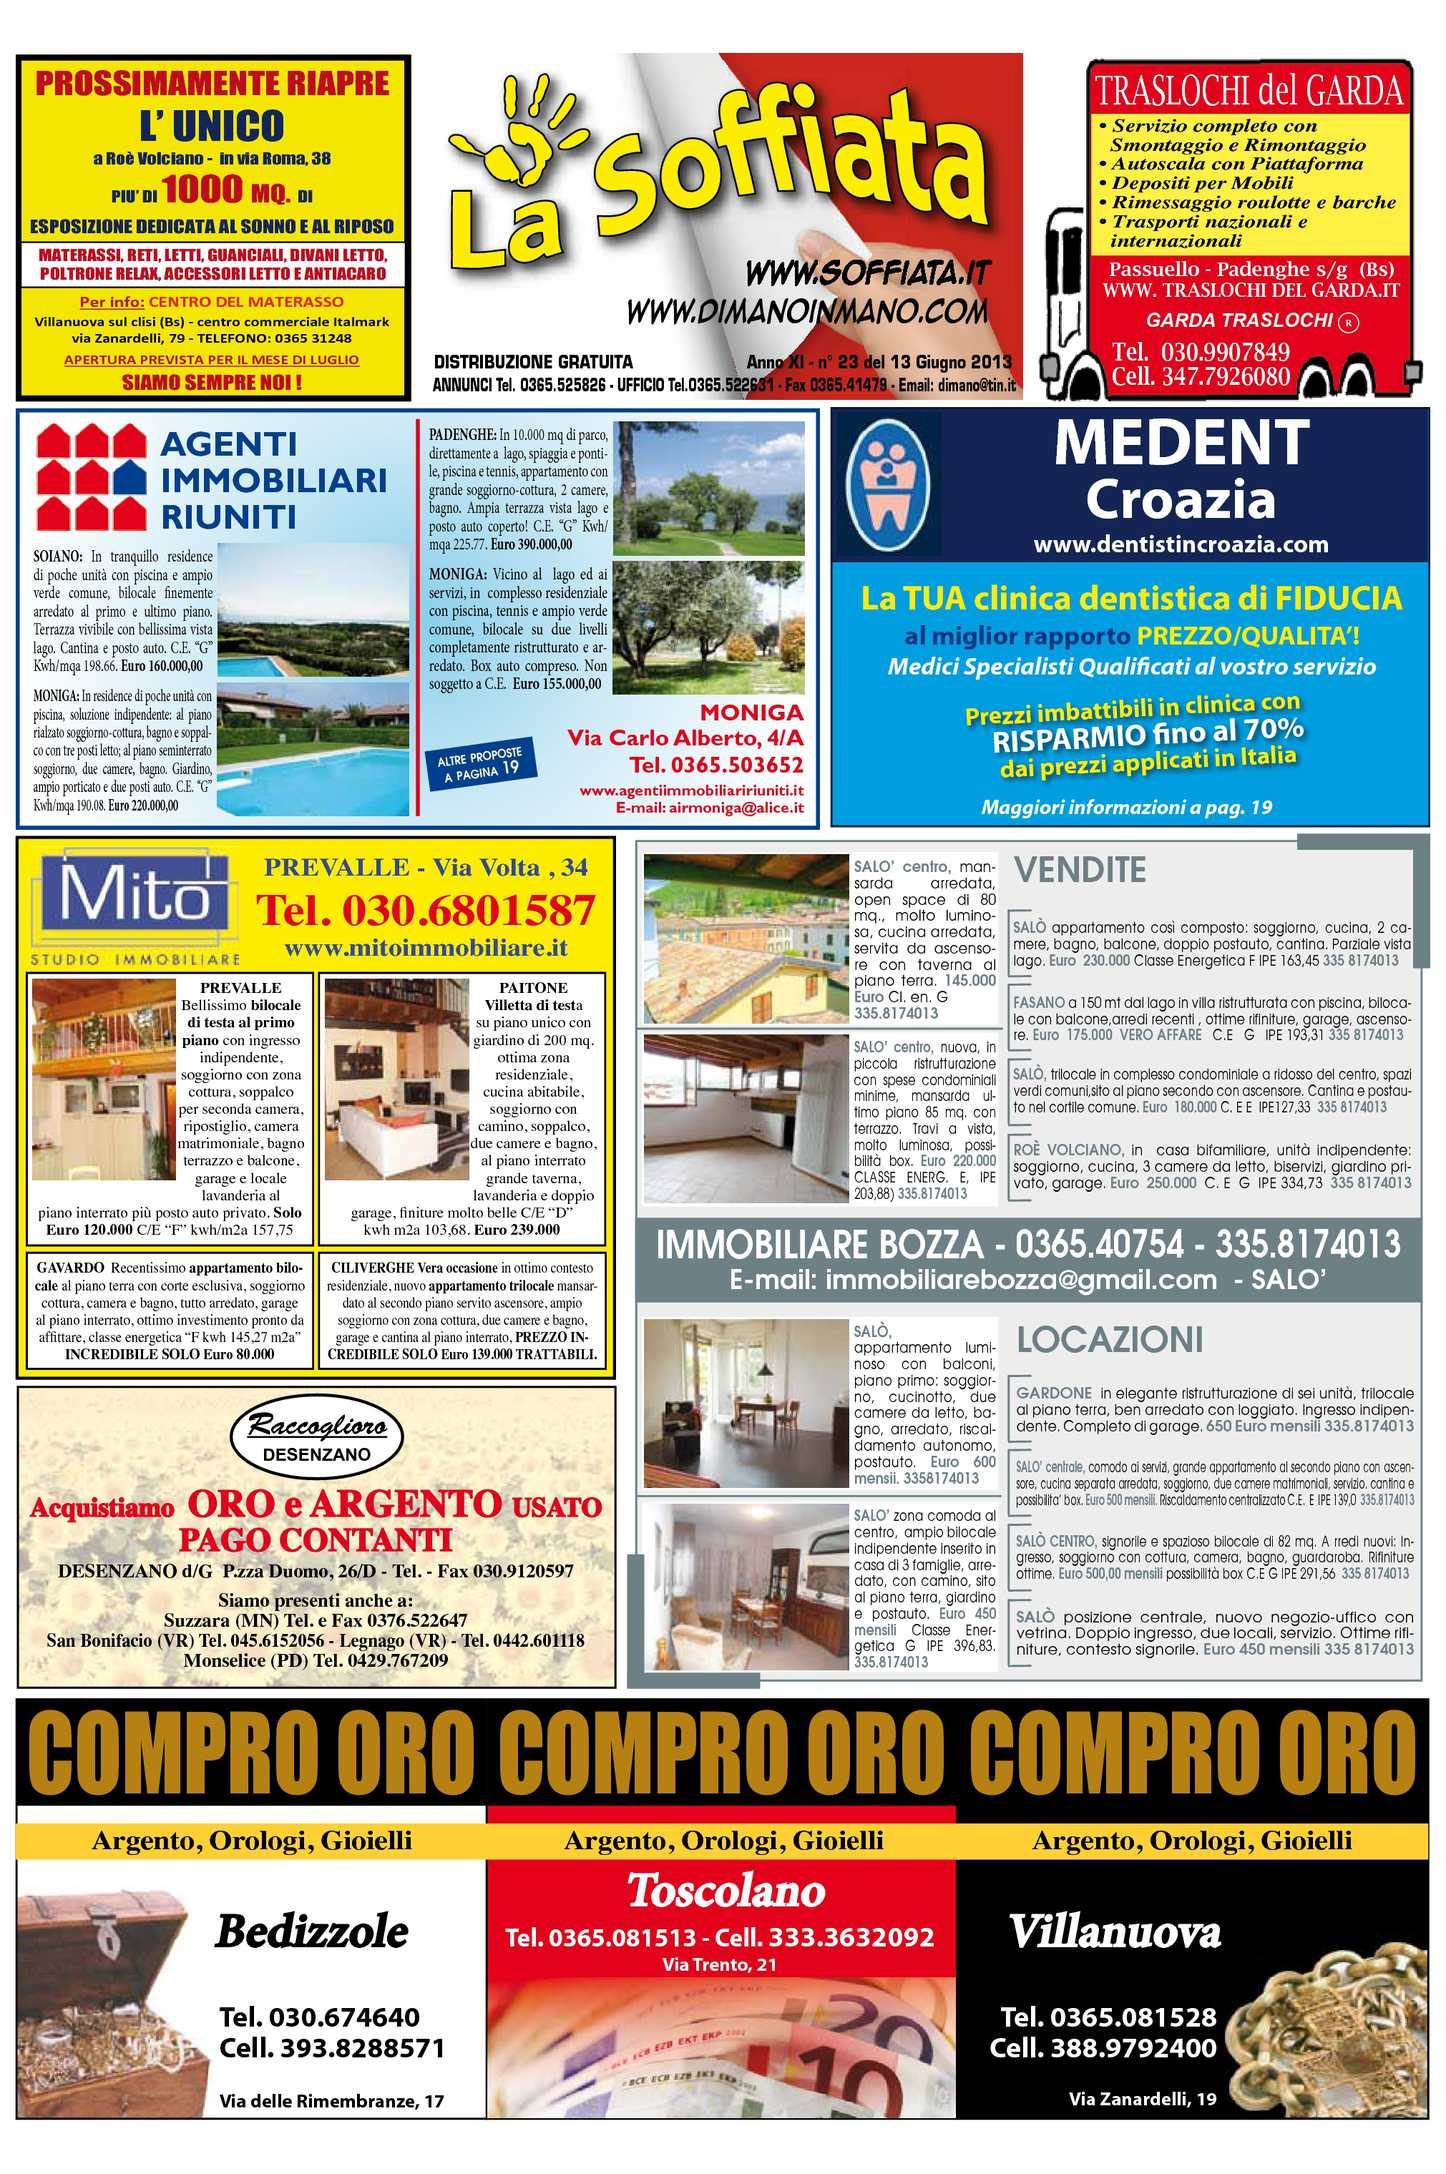 Calaméo La soffiata 13062013